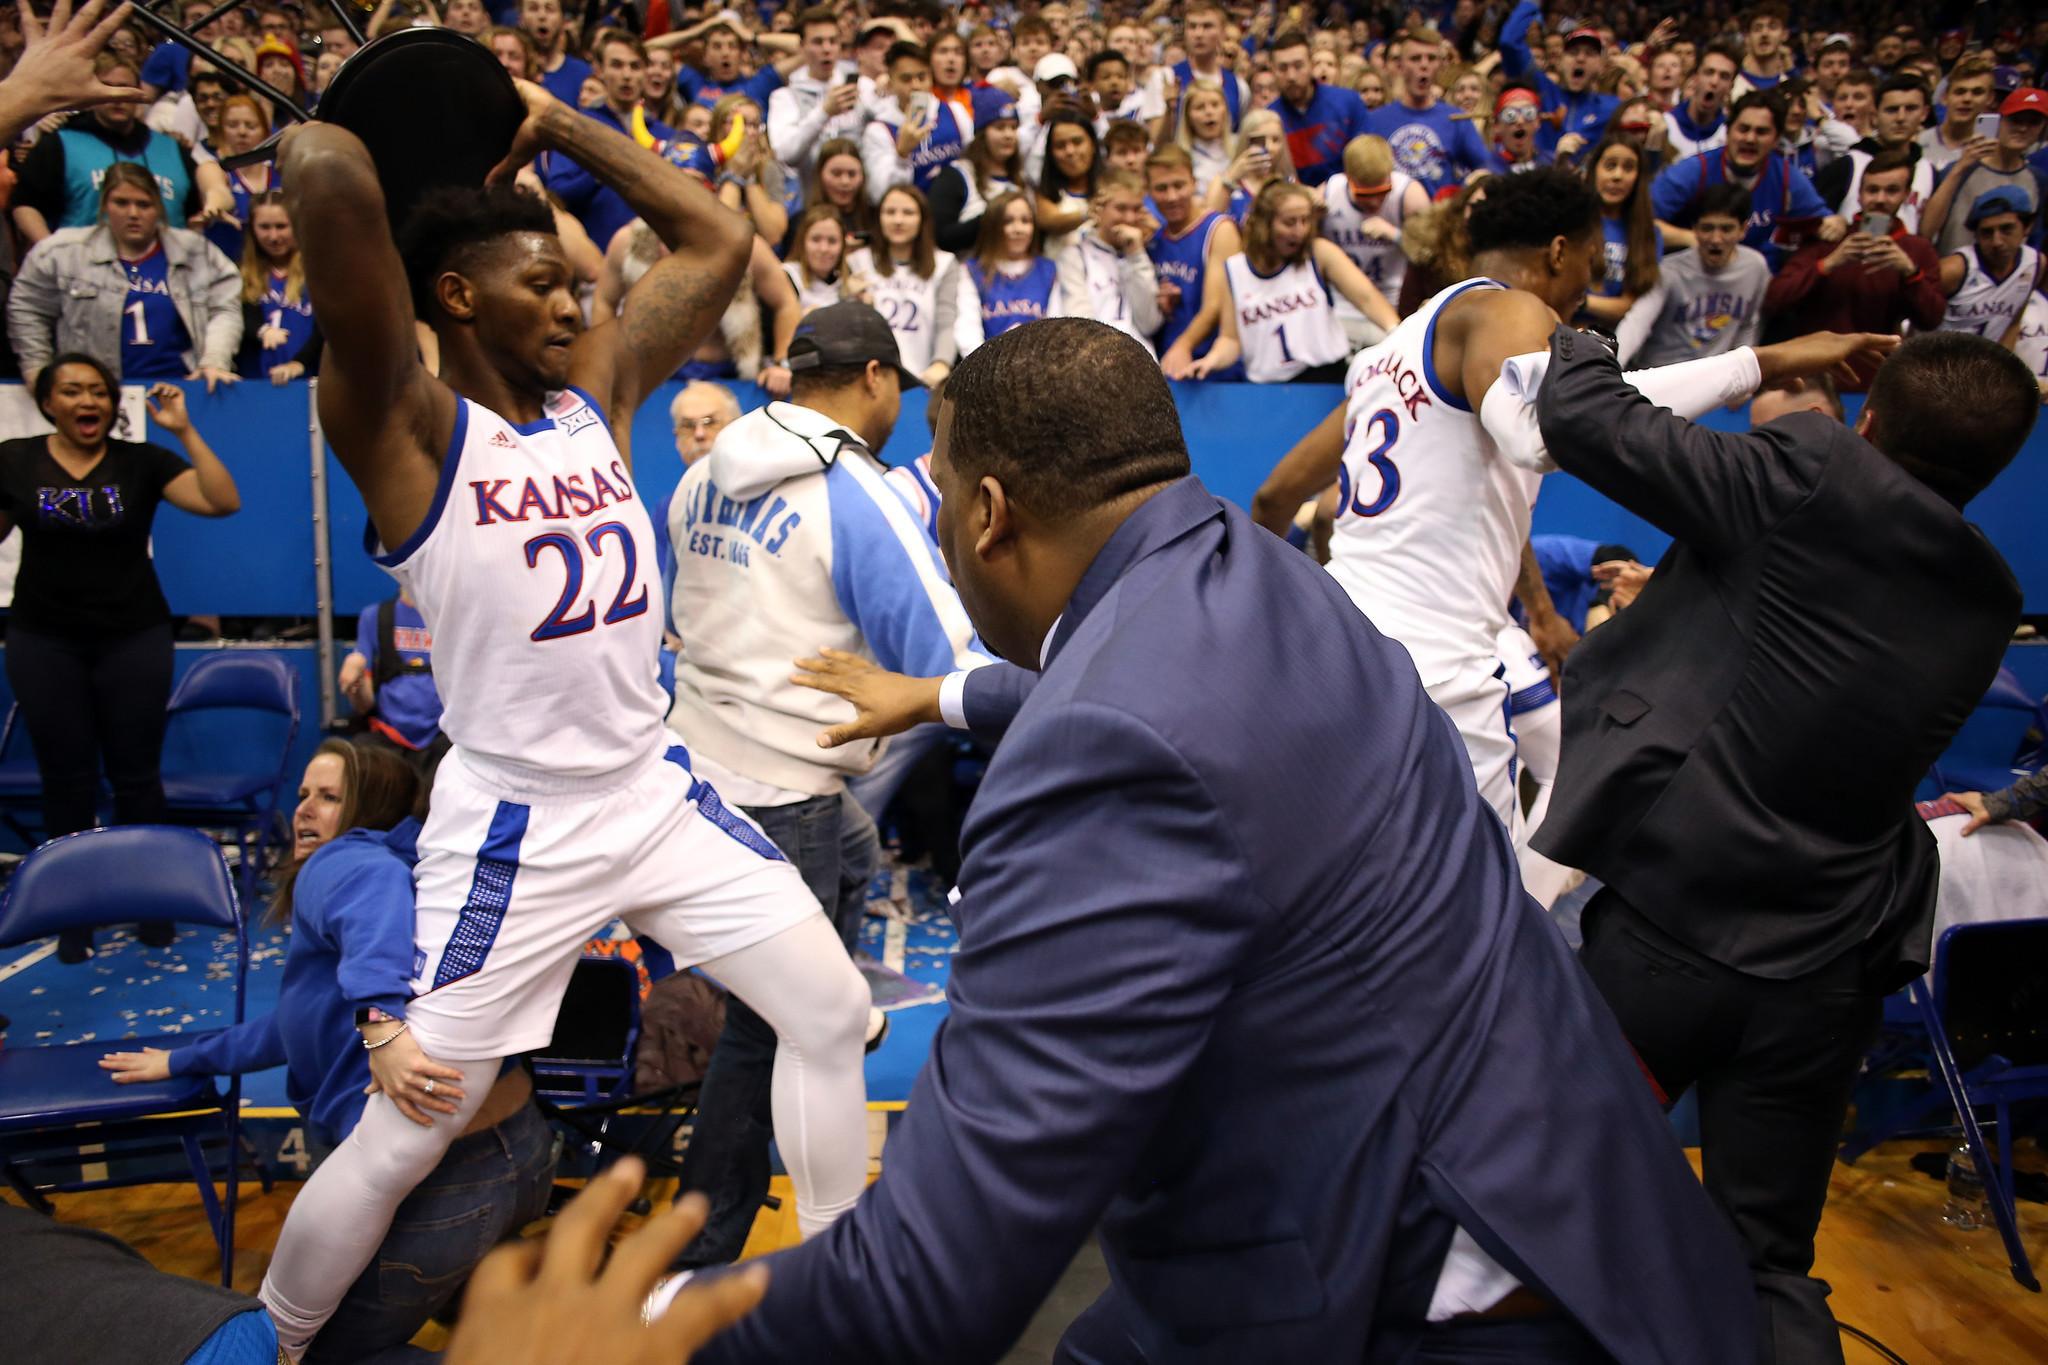 Kansas suspends Silvio De Sousa indefinitely over role in ugly brawl vs. Kansas State